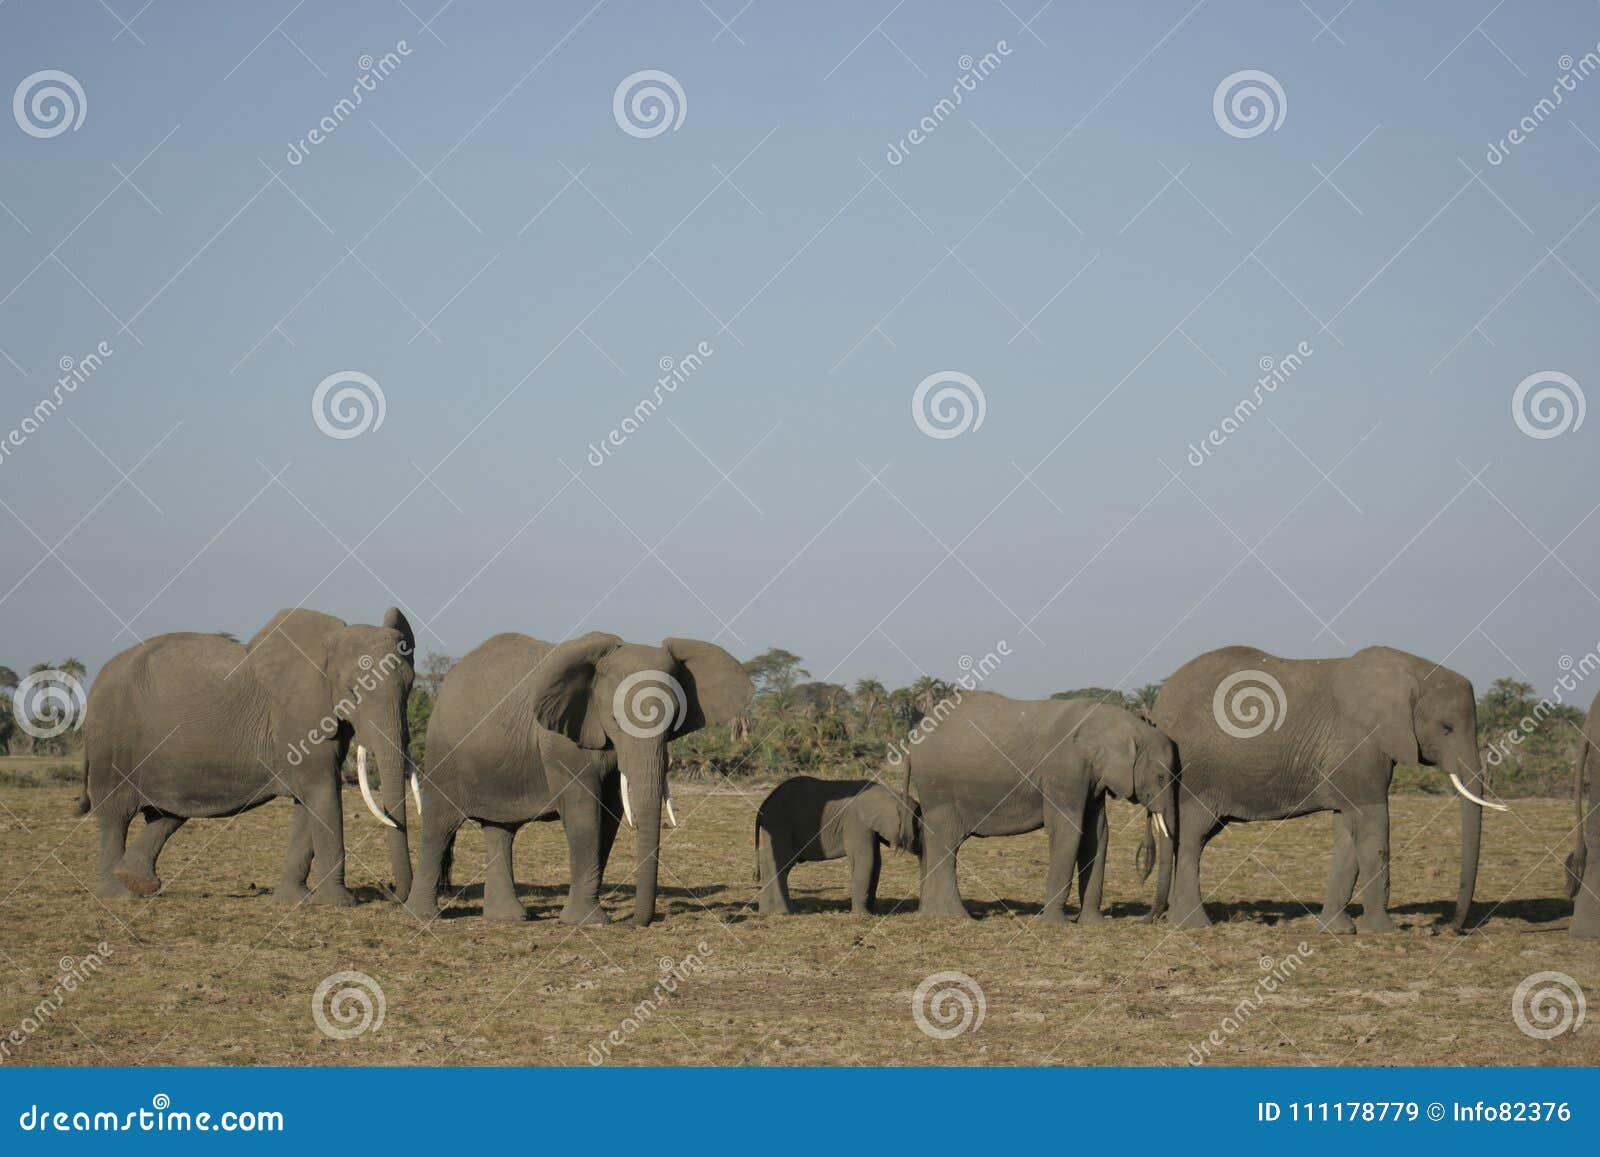 Loxodonta Africana Degli Elefanti Africani, Ndovu O Tembo E